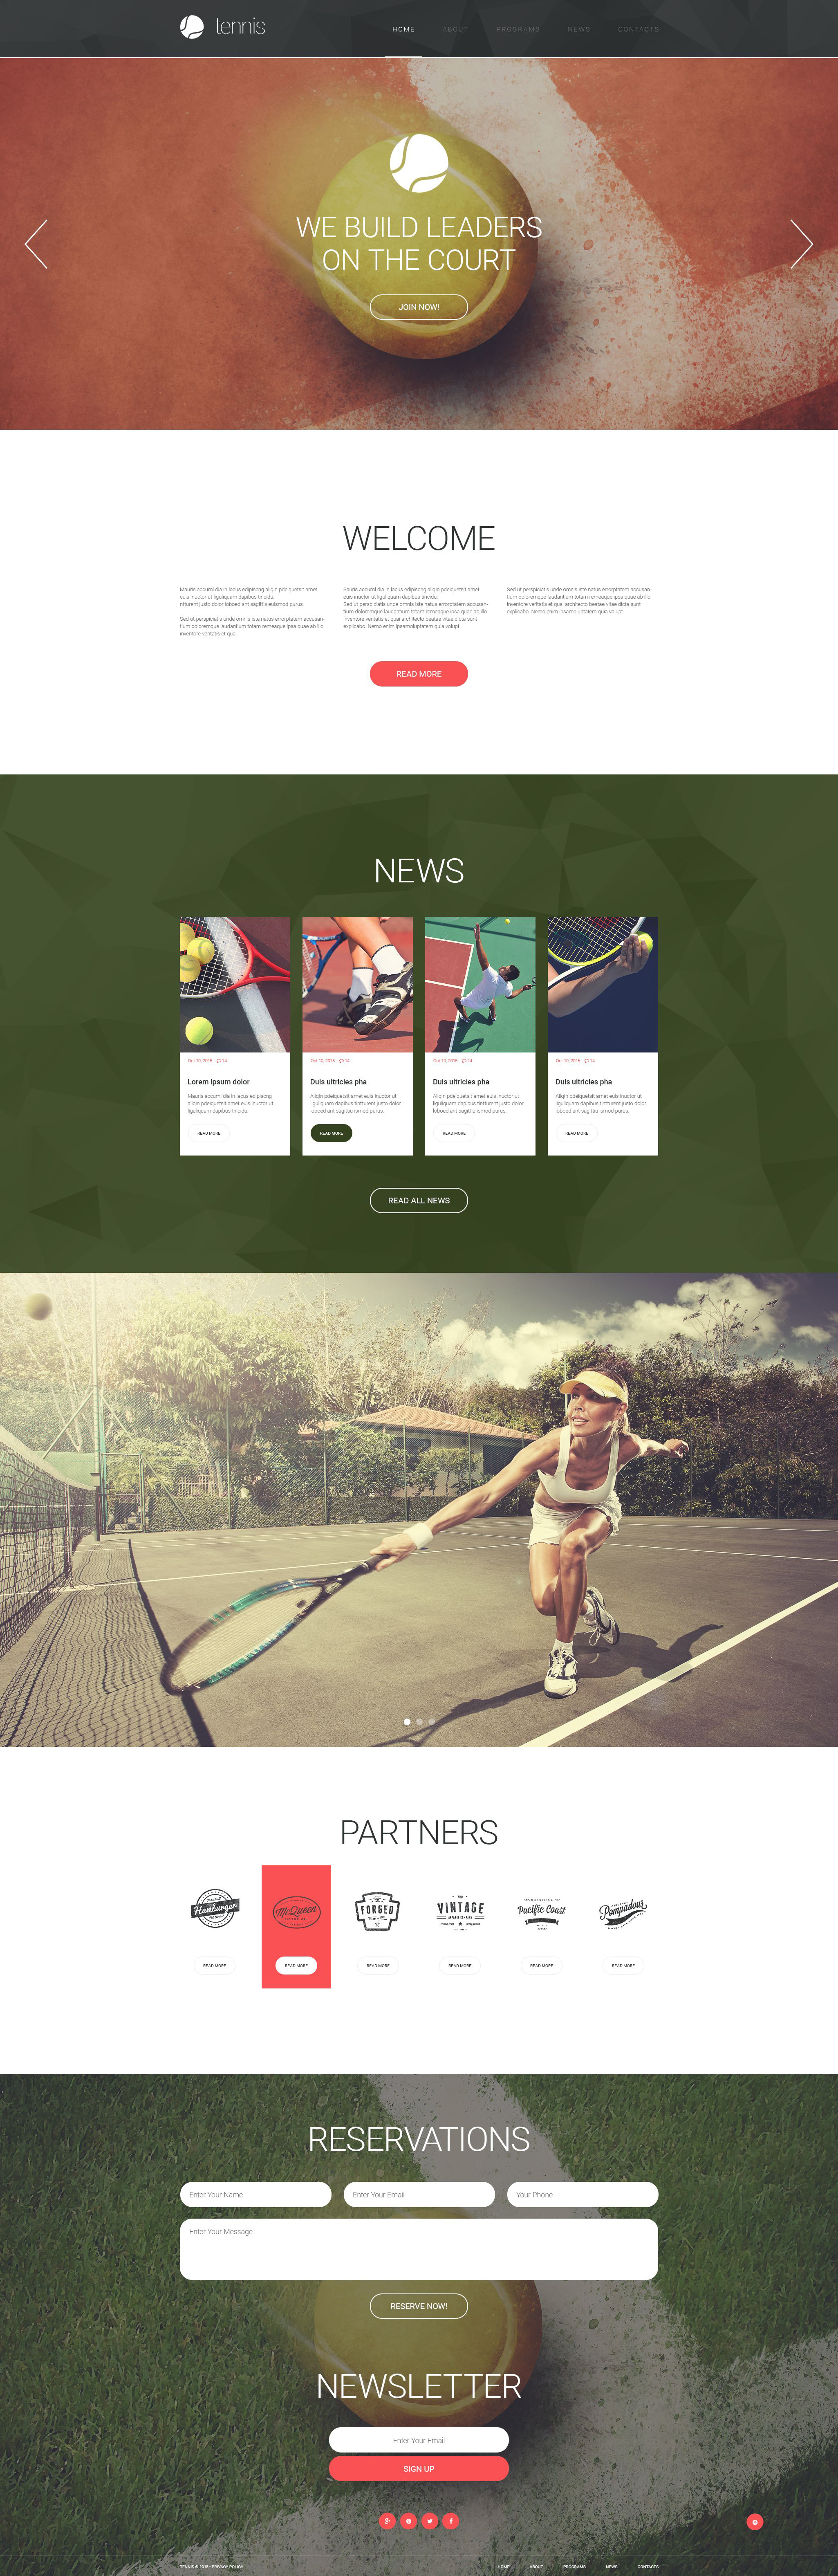 Tennis Responsive Website Template